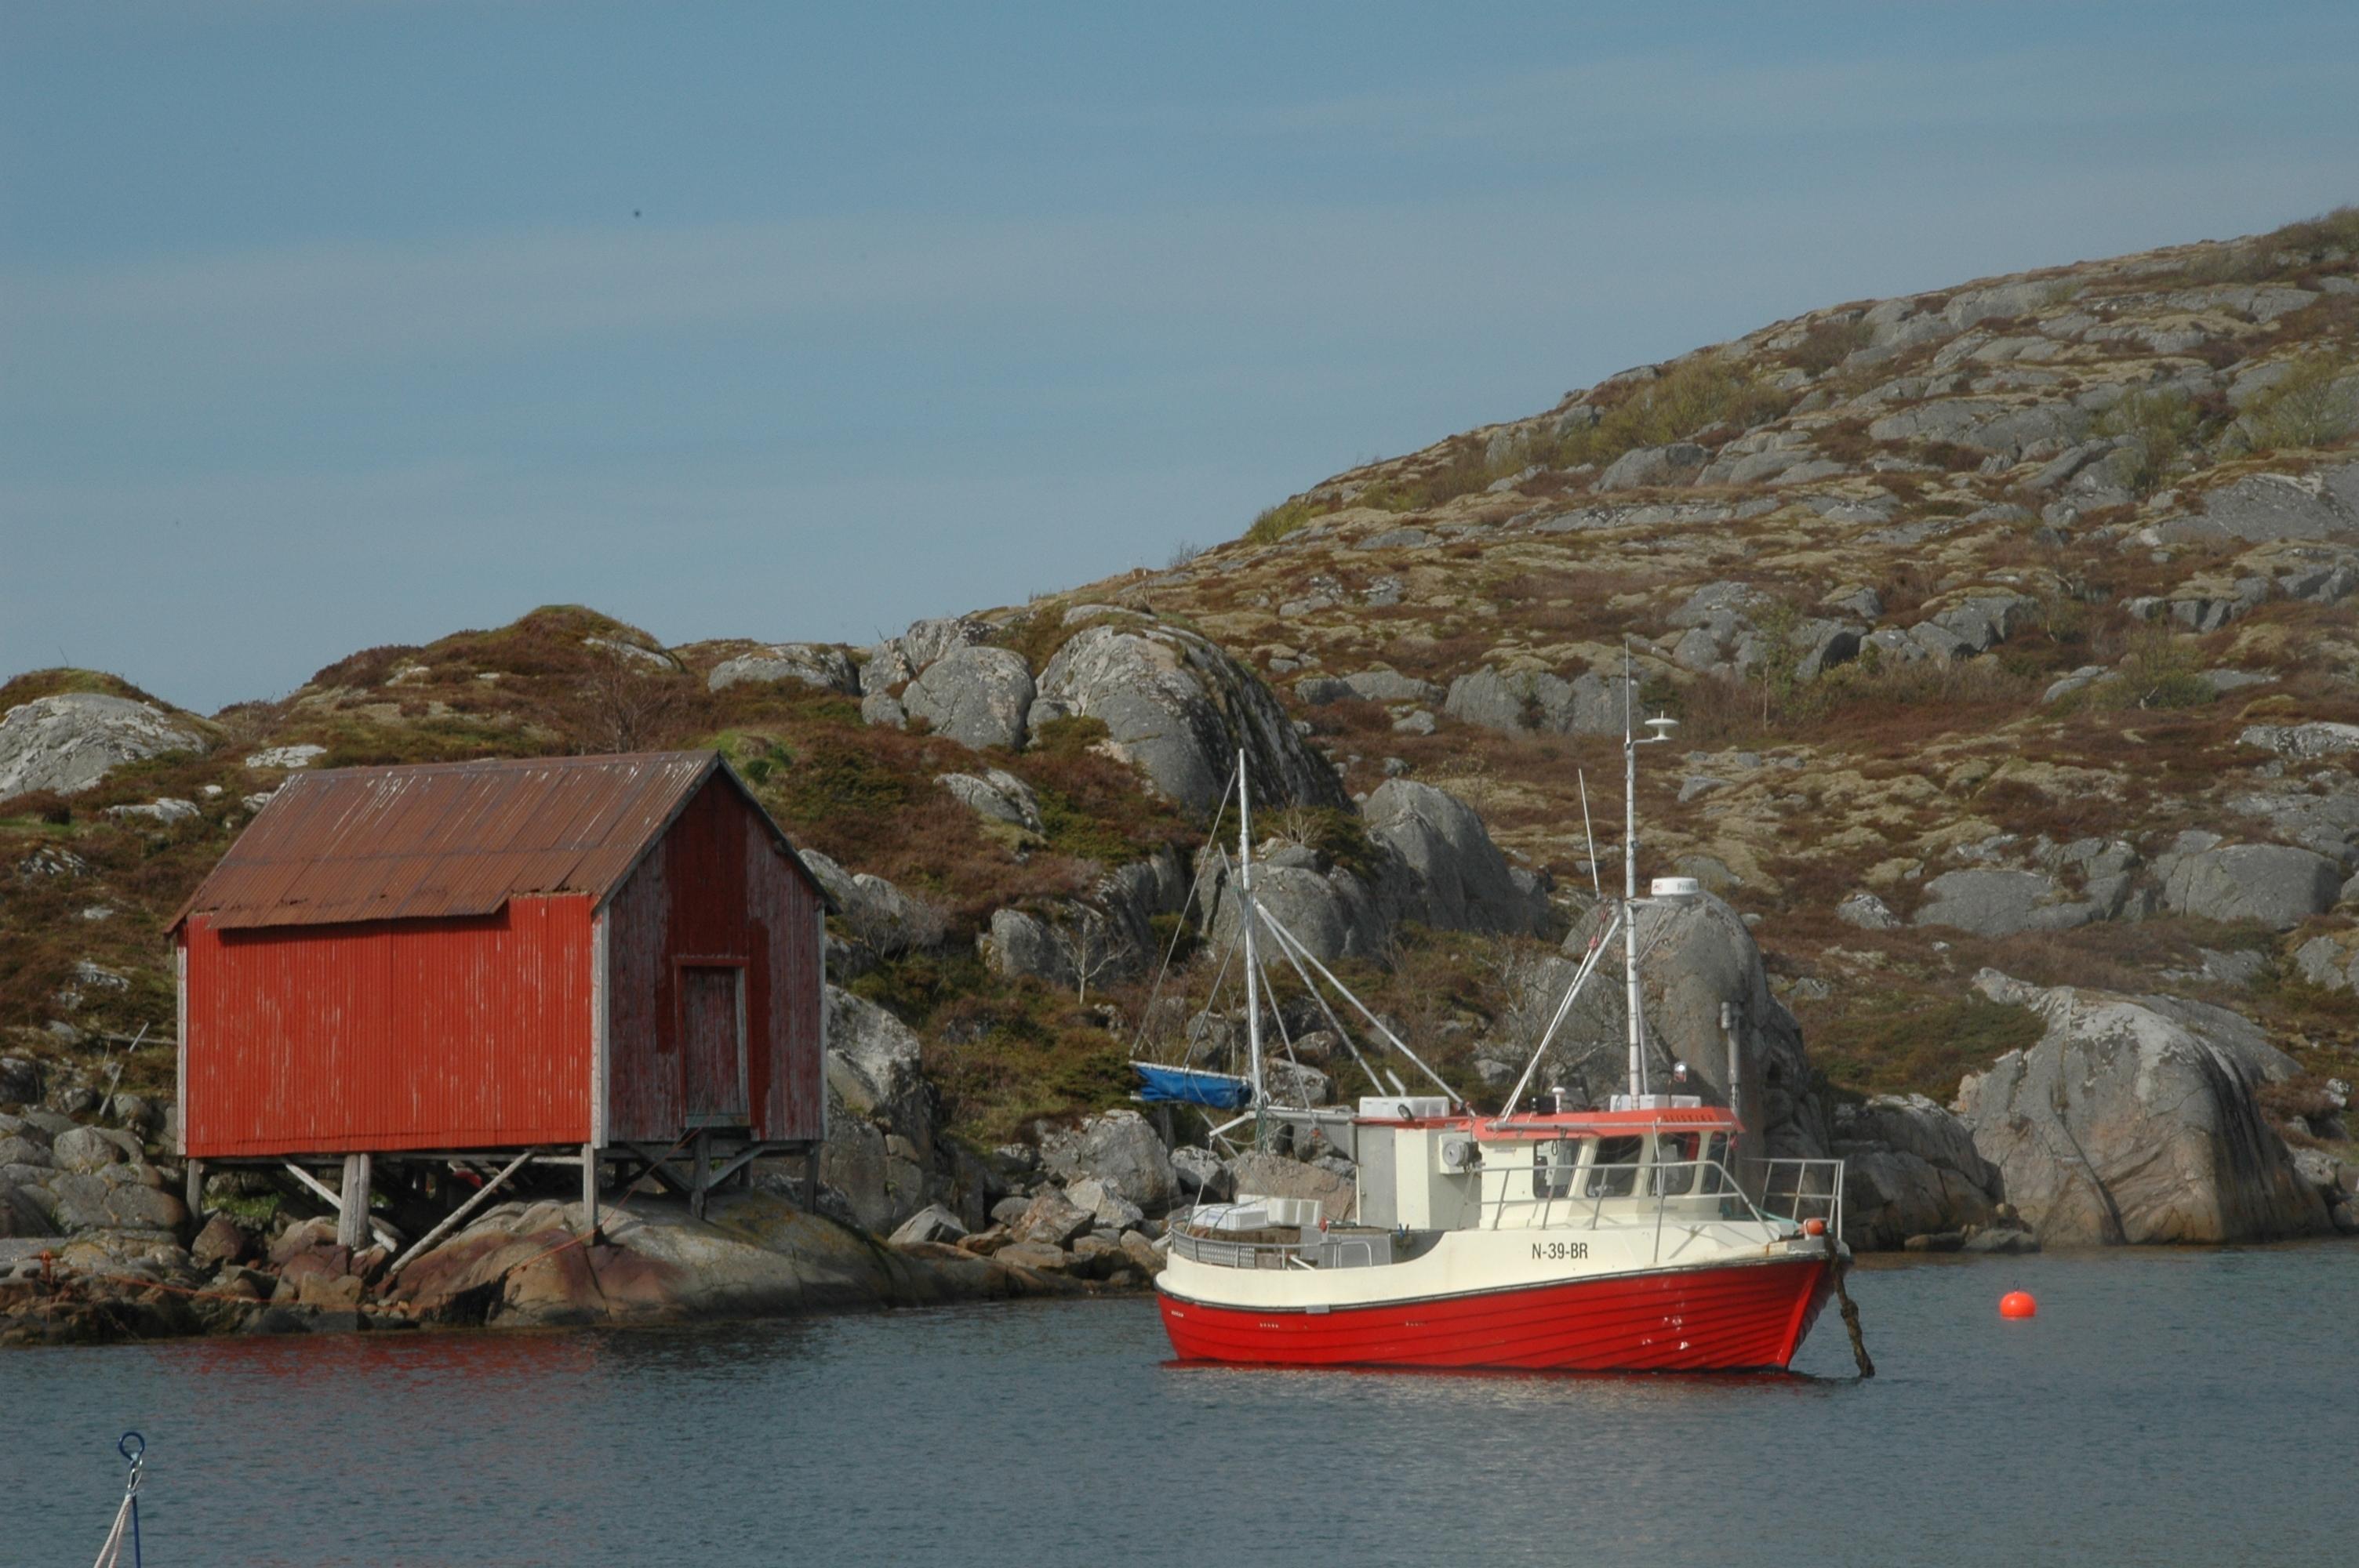 Case di pescatori norvegesi: foto di Germana Cabrelle